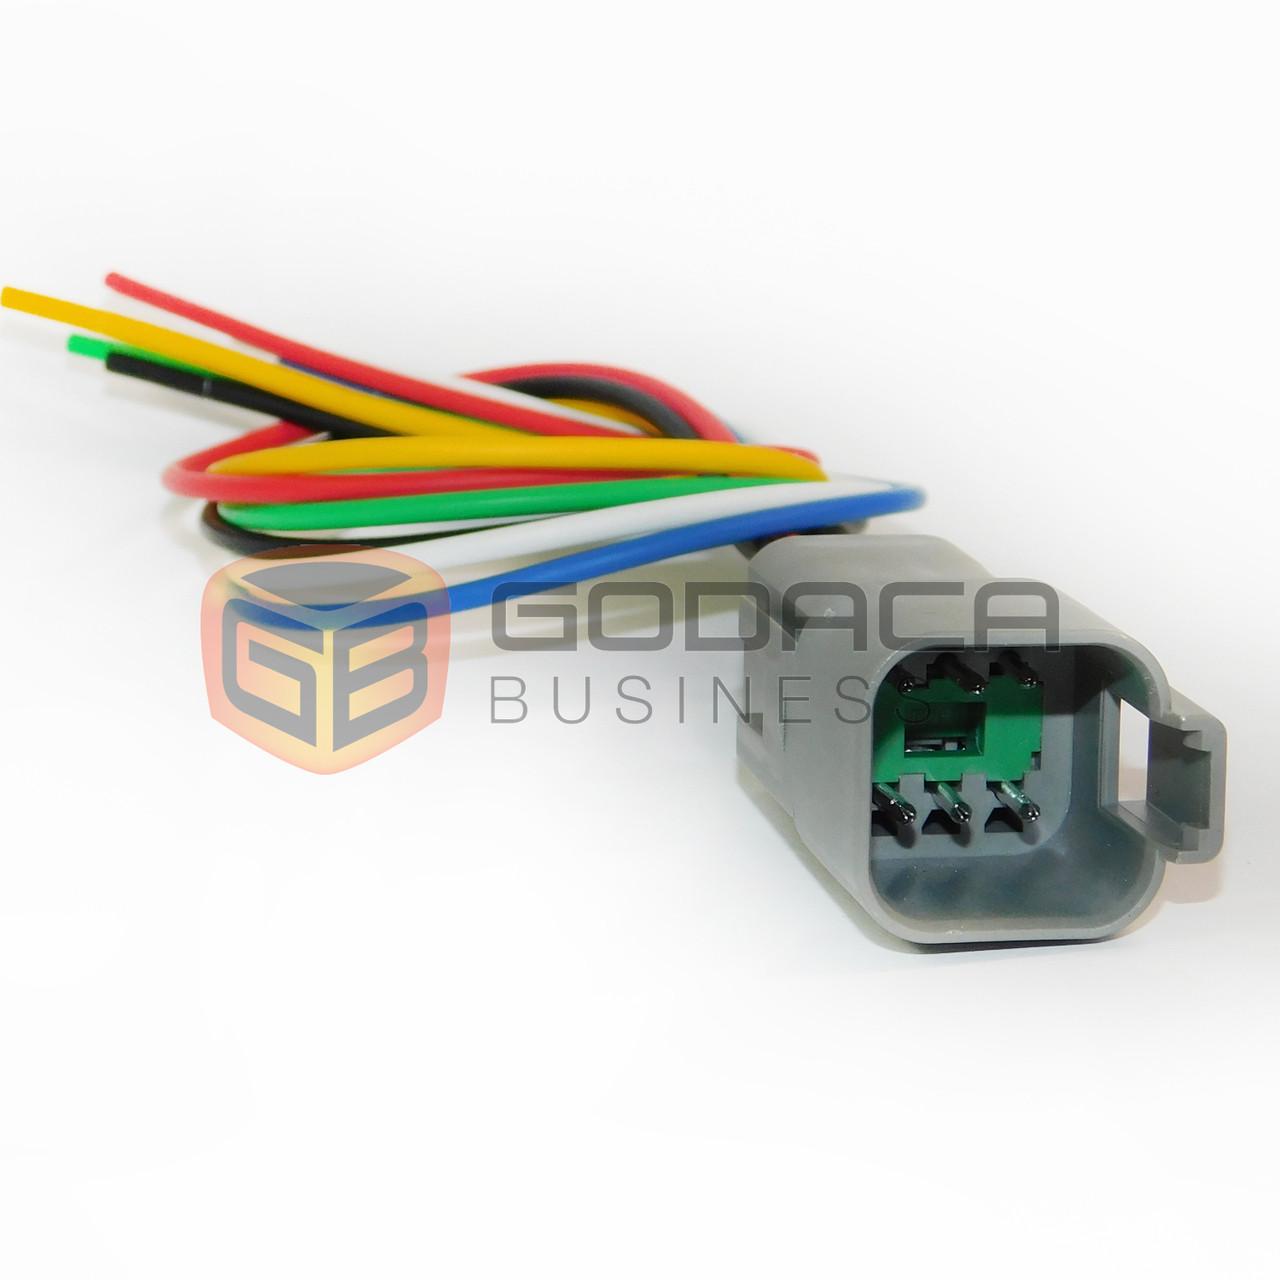 1x Set male Connector Plug 6-way 6 pin Deutsch DT series with wire ...